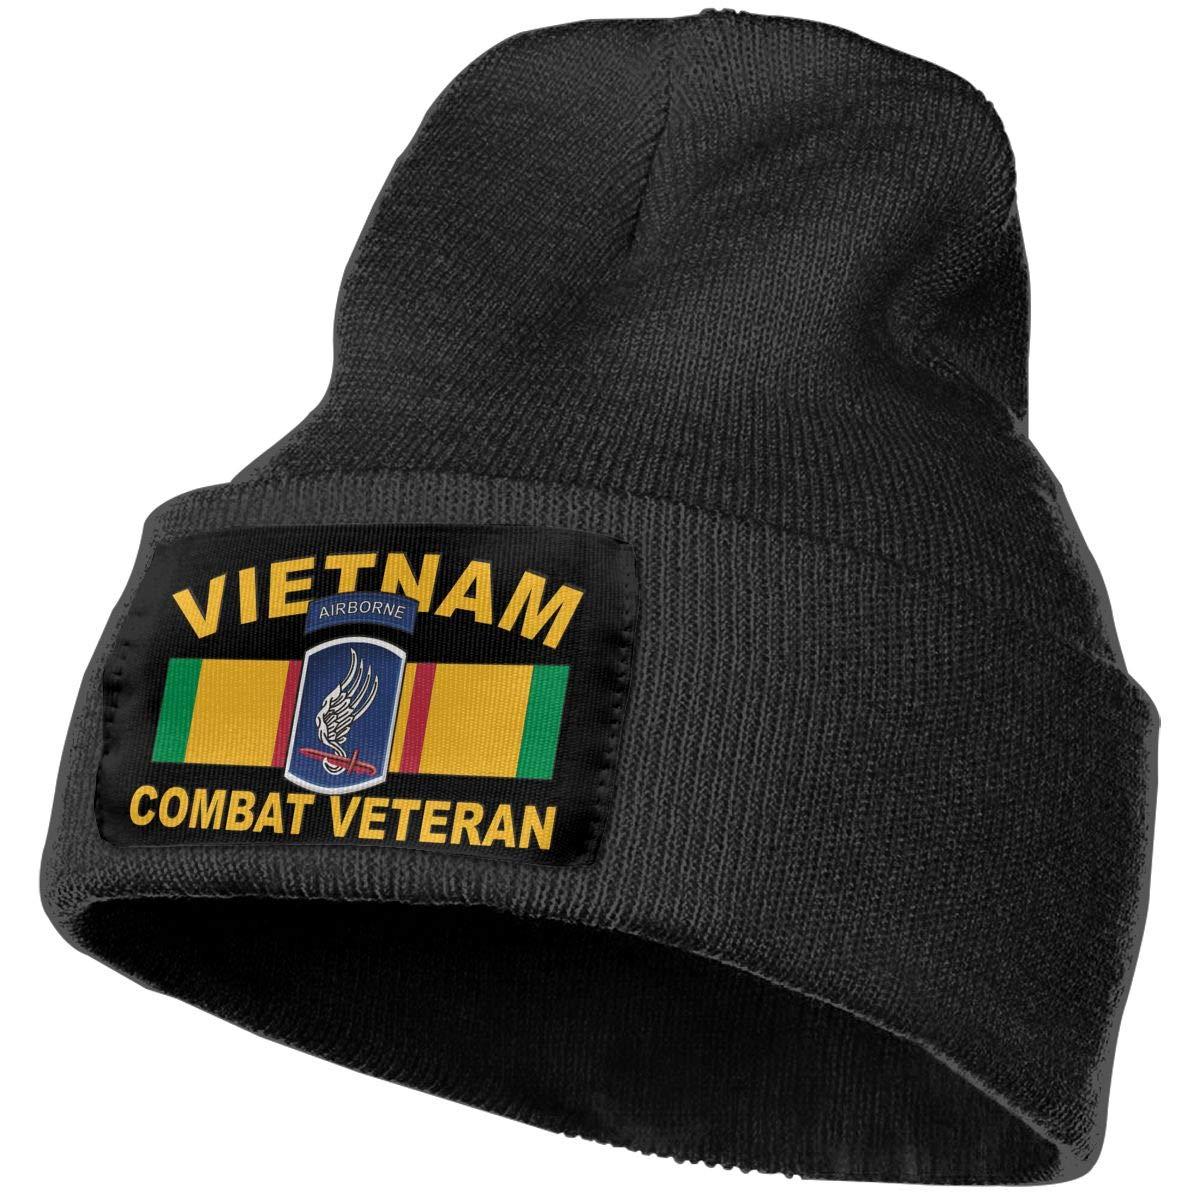 173rd Airborne Vietnam Combat Veteran Men/&Women Warm Winter Knit Plain Beanie Hat Skull Cap Acrylic Knit Cuff Hat